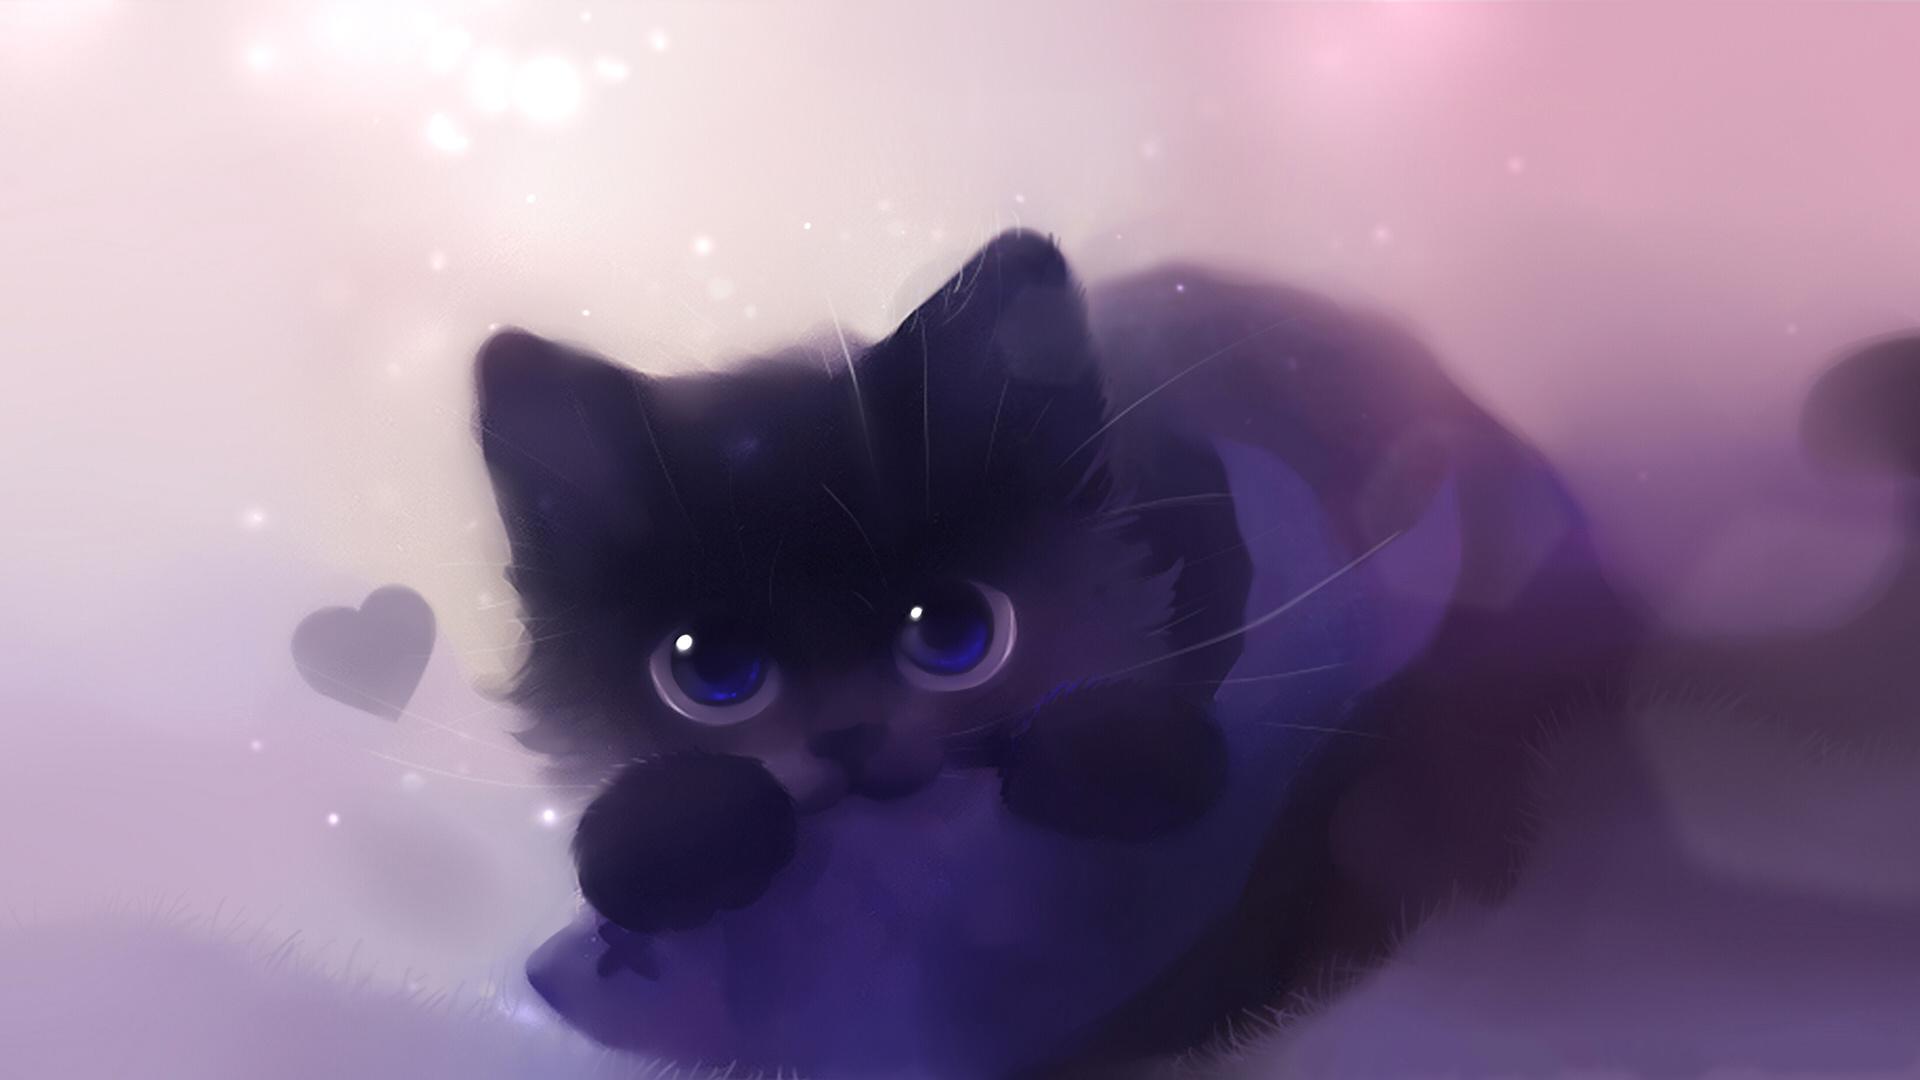 Cute Baby Pics For Whatsapp Wallpaper Download Free Warrior Cats Backgrounds Pixelstalk Net